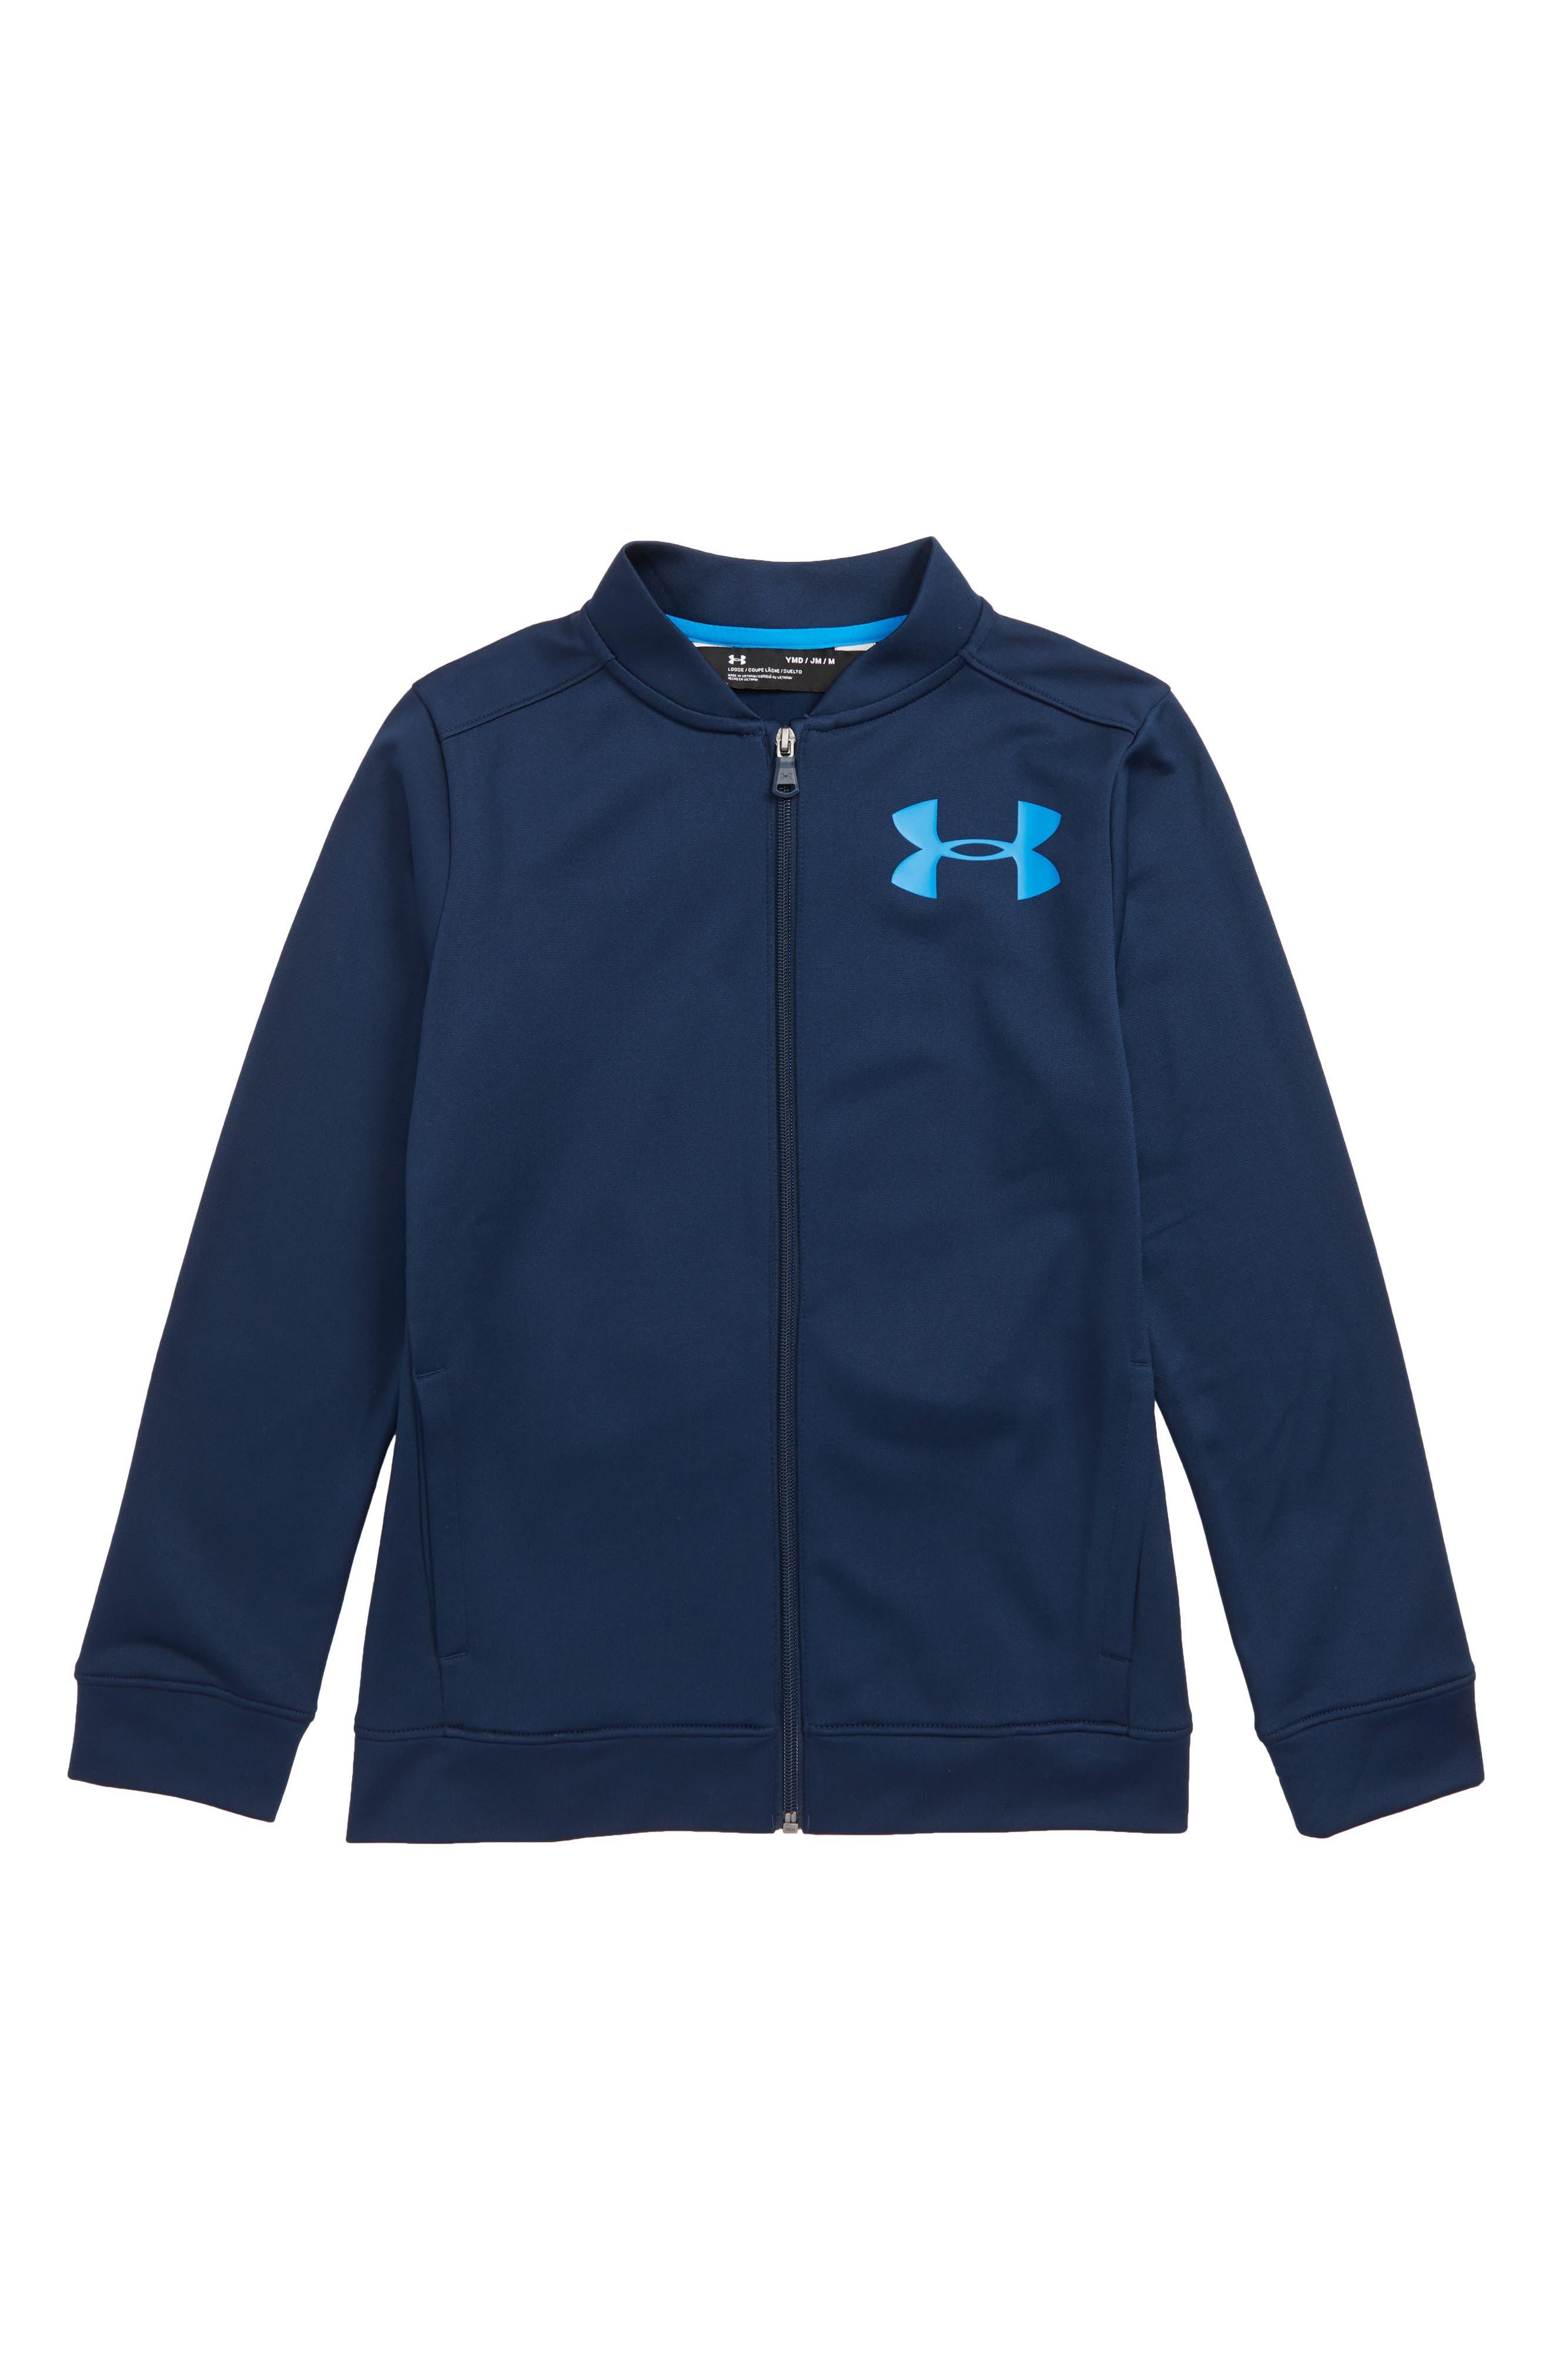 Pennant 2.0 Jacket,                         Main,                         color, ACADEMY / / BLUE CIRCUIT